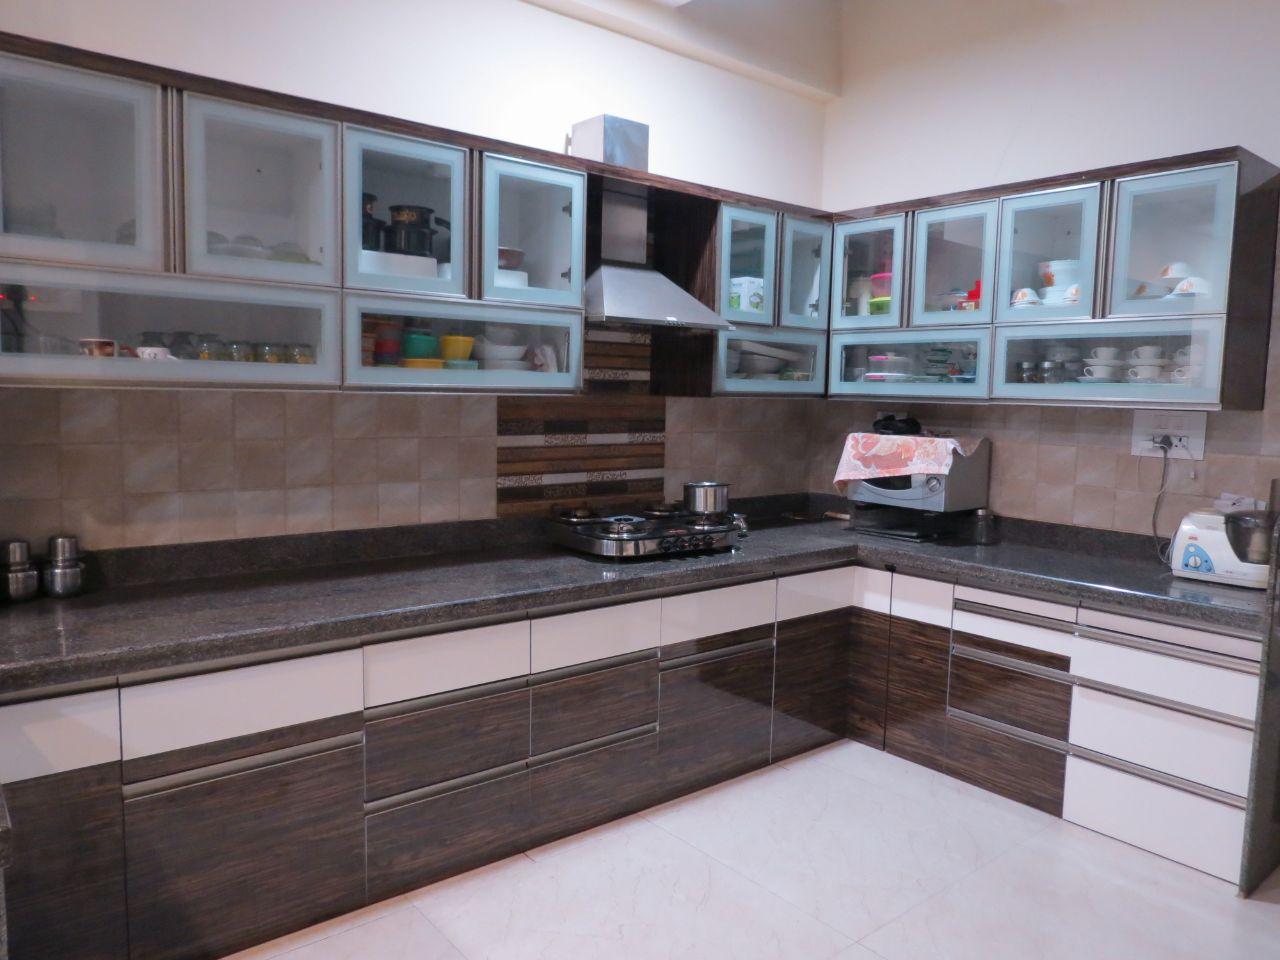 Stylish kitchen by Rohan Tapkire Modern | Interior Design Photos & Ideas